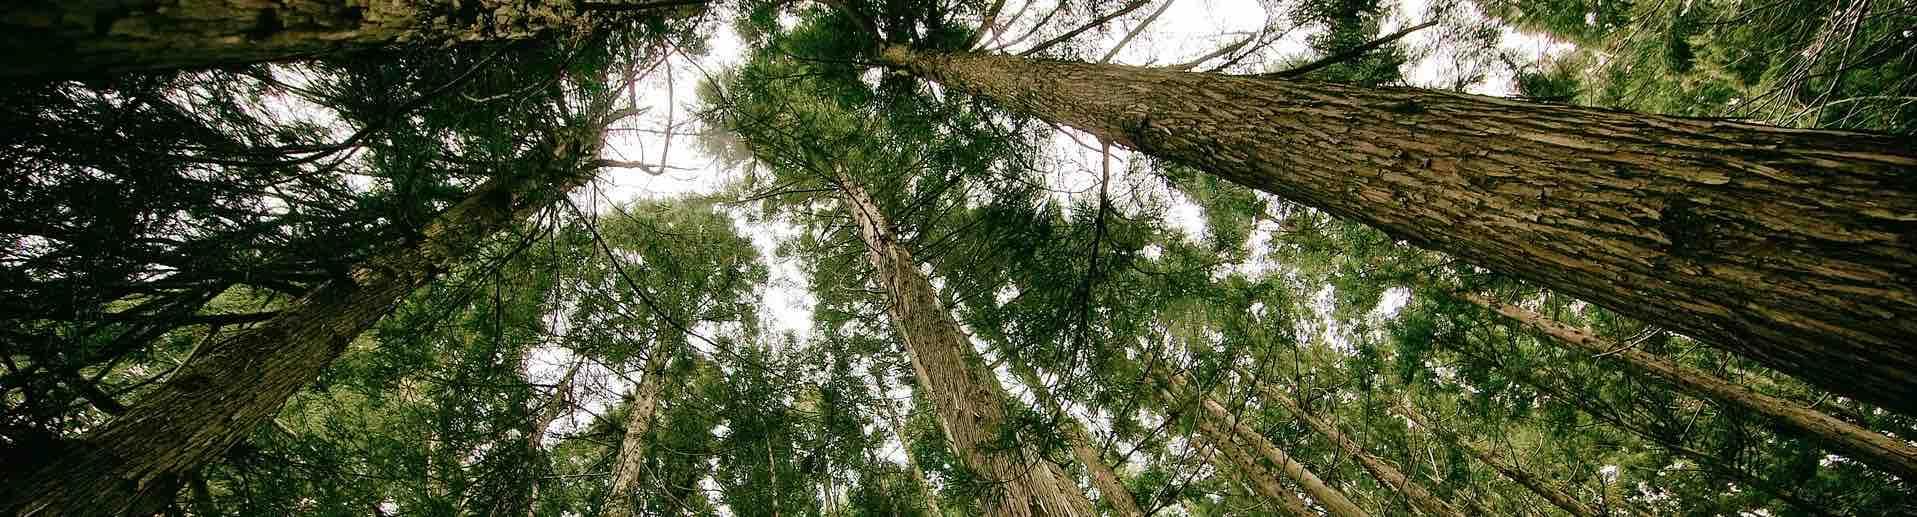 foret avec des arbres